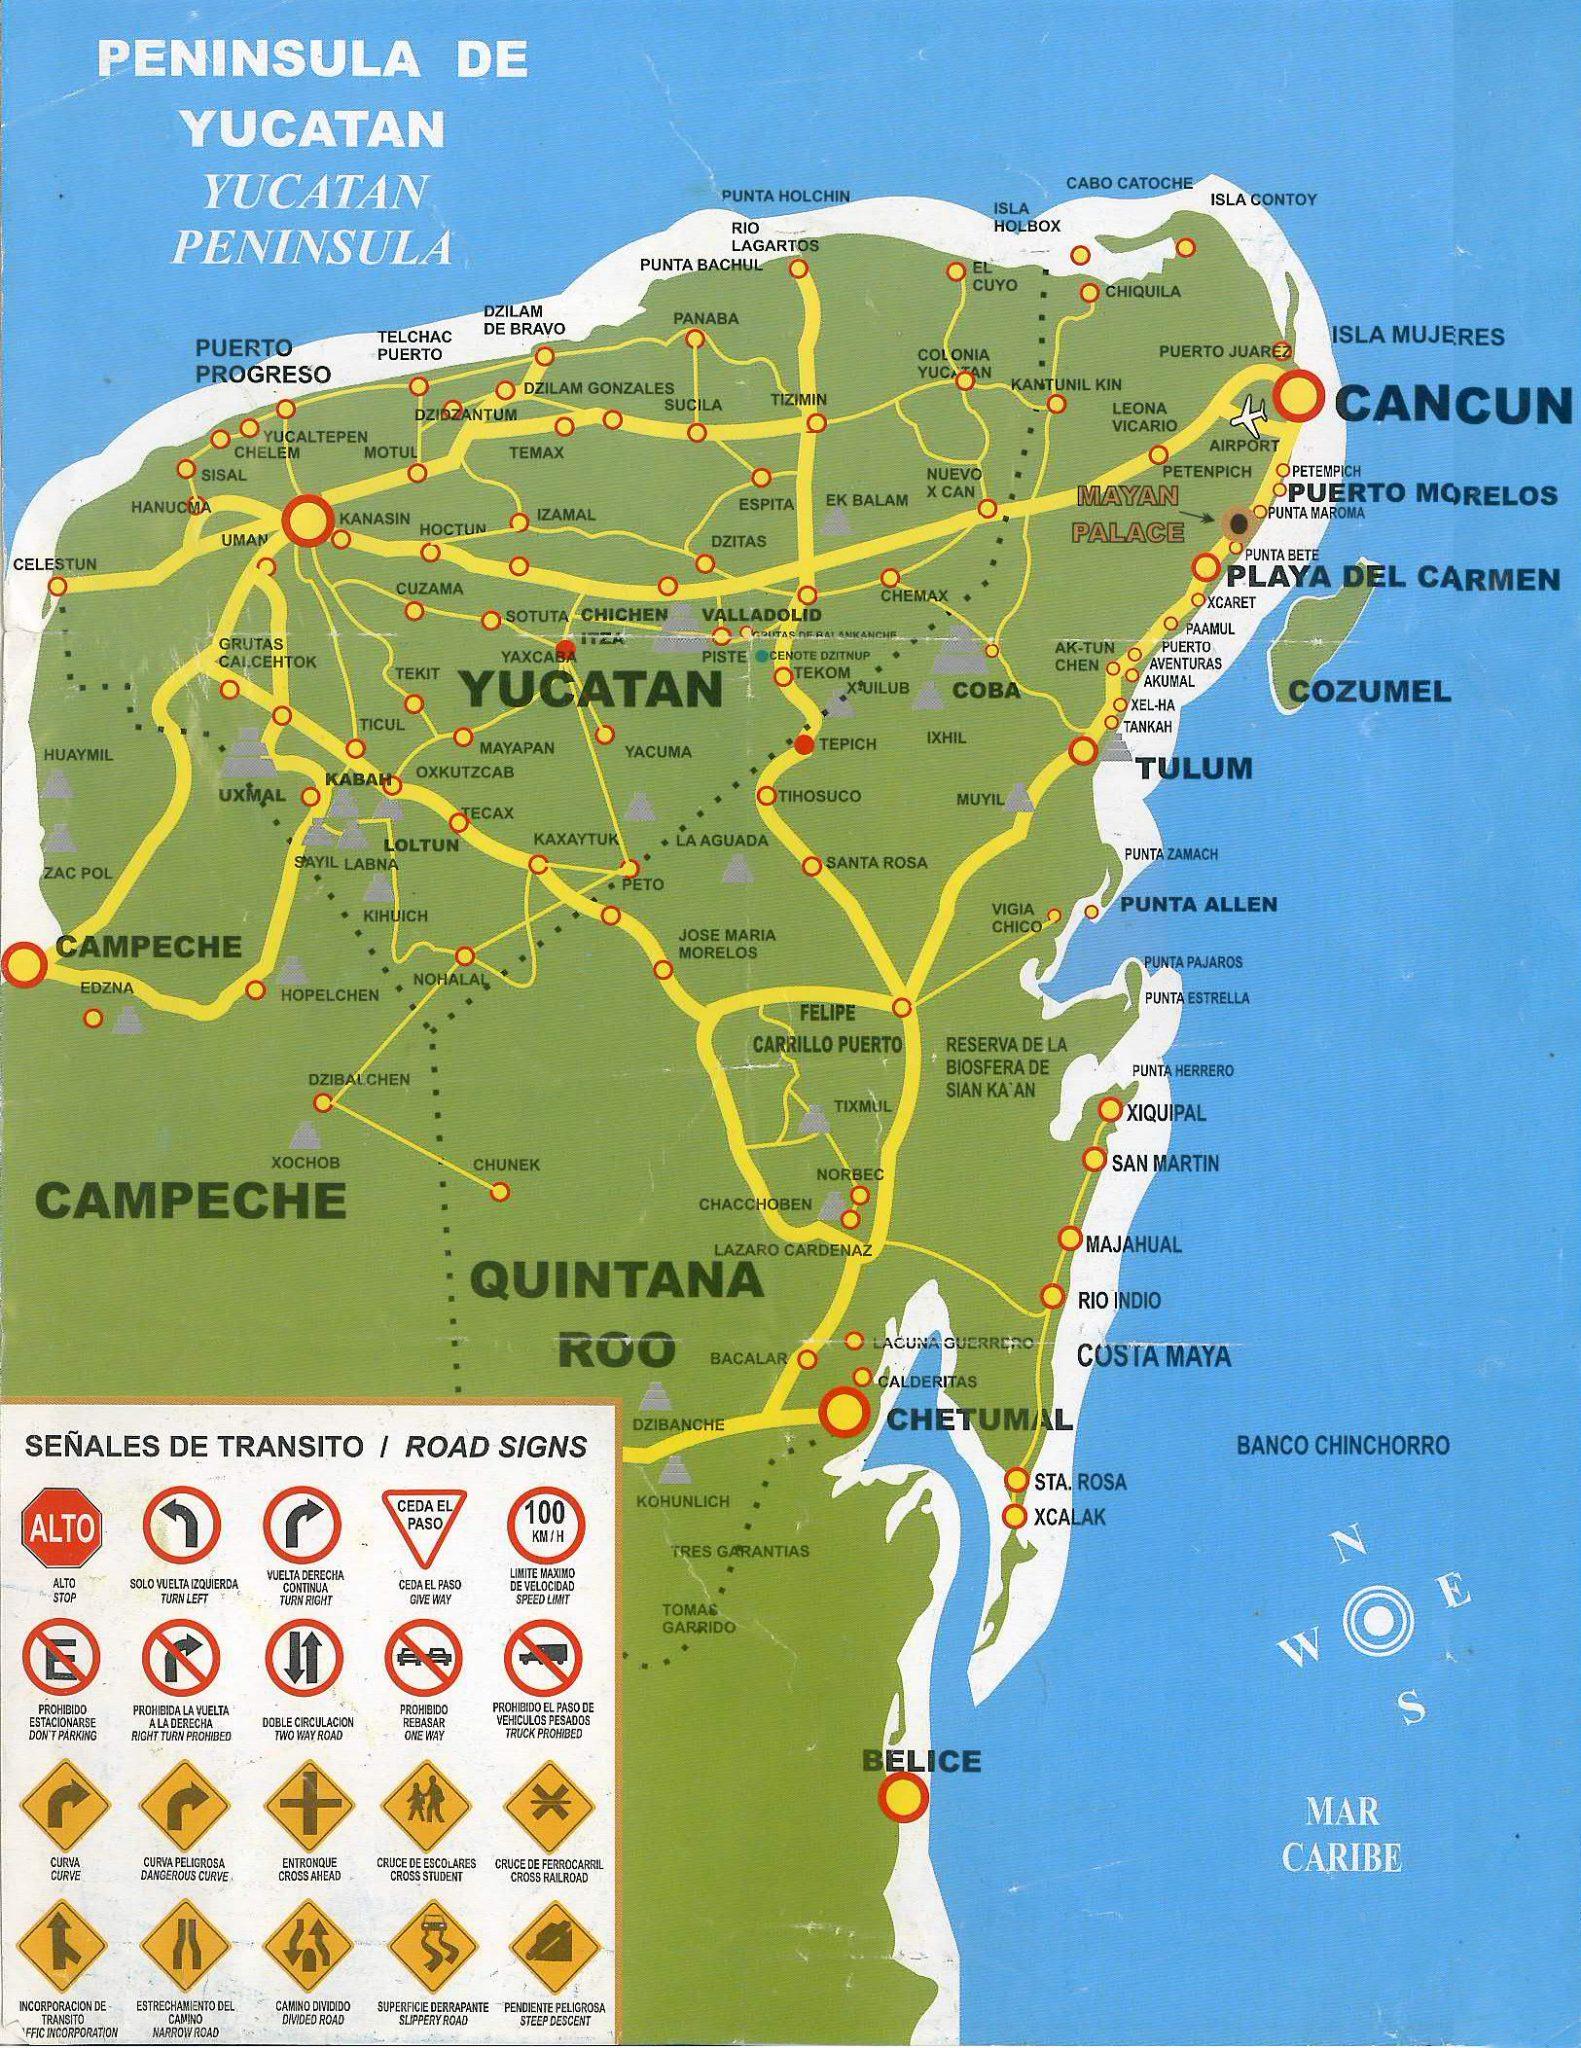 03 MAPA YUCATAN - Meksyk - Jukatan informacje ogólne